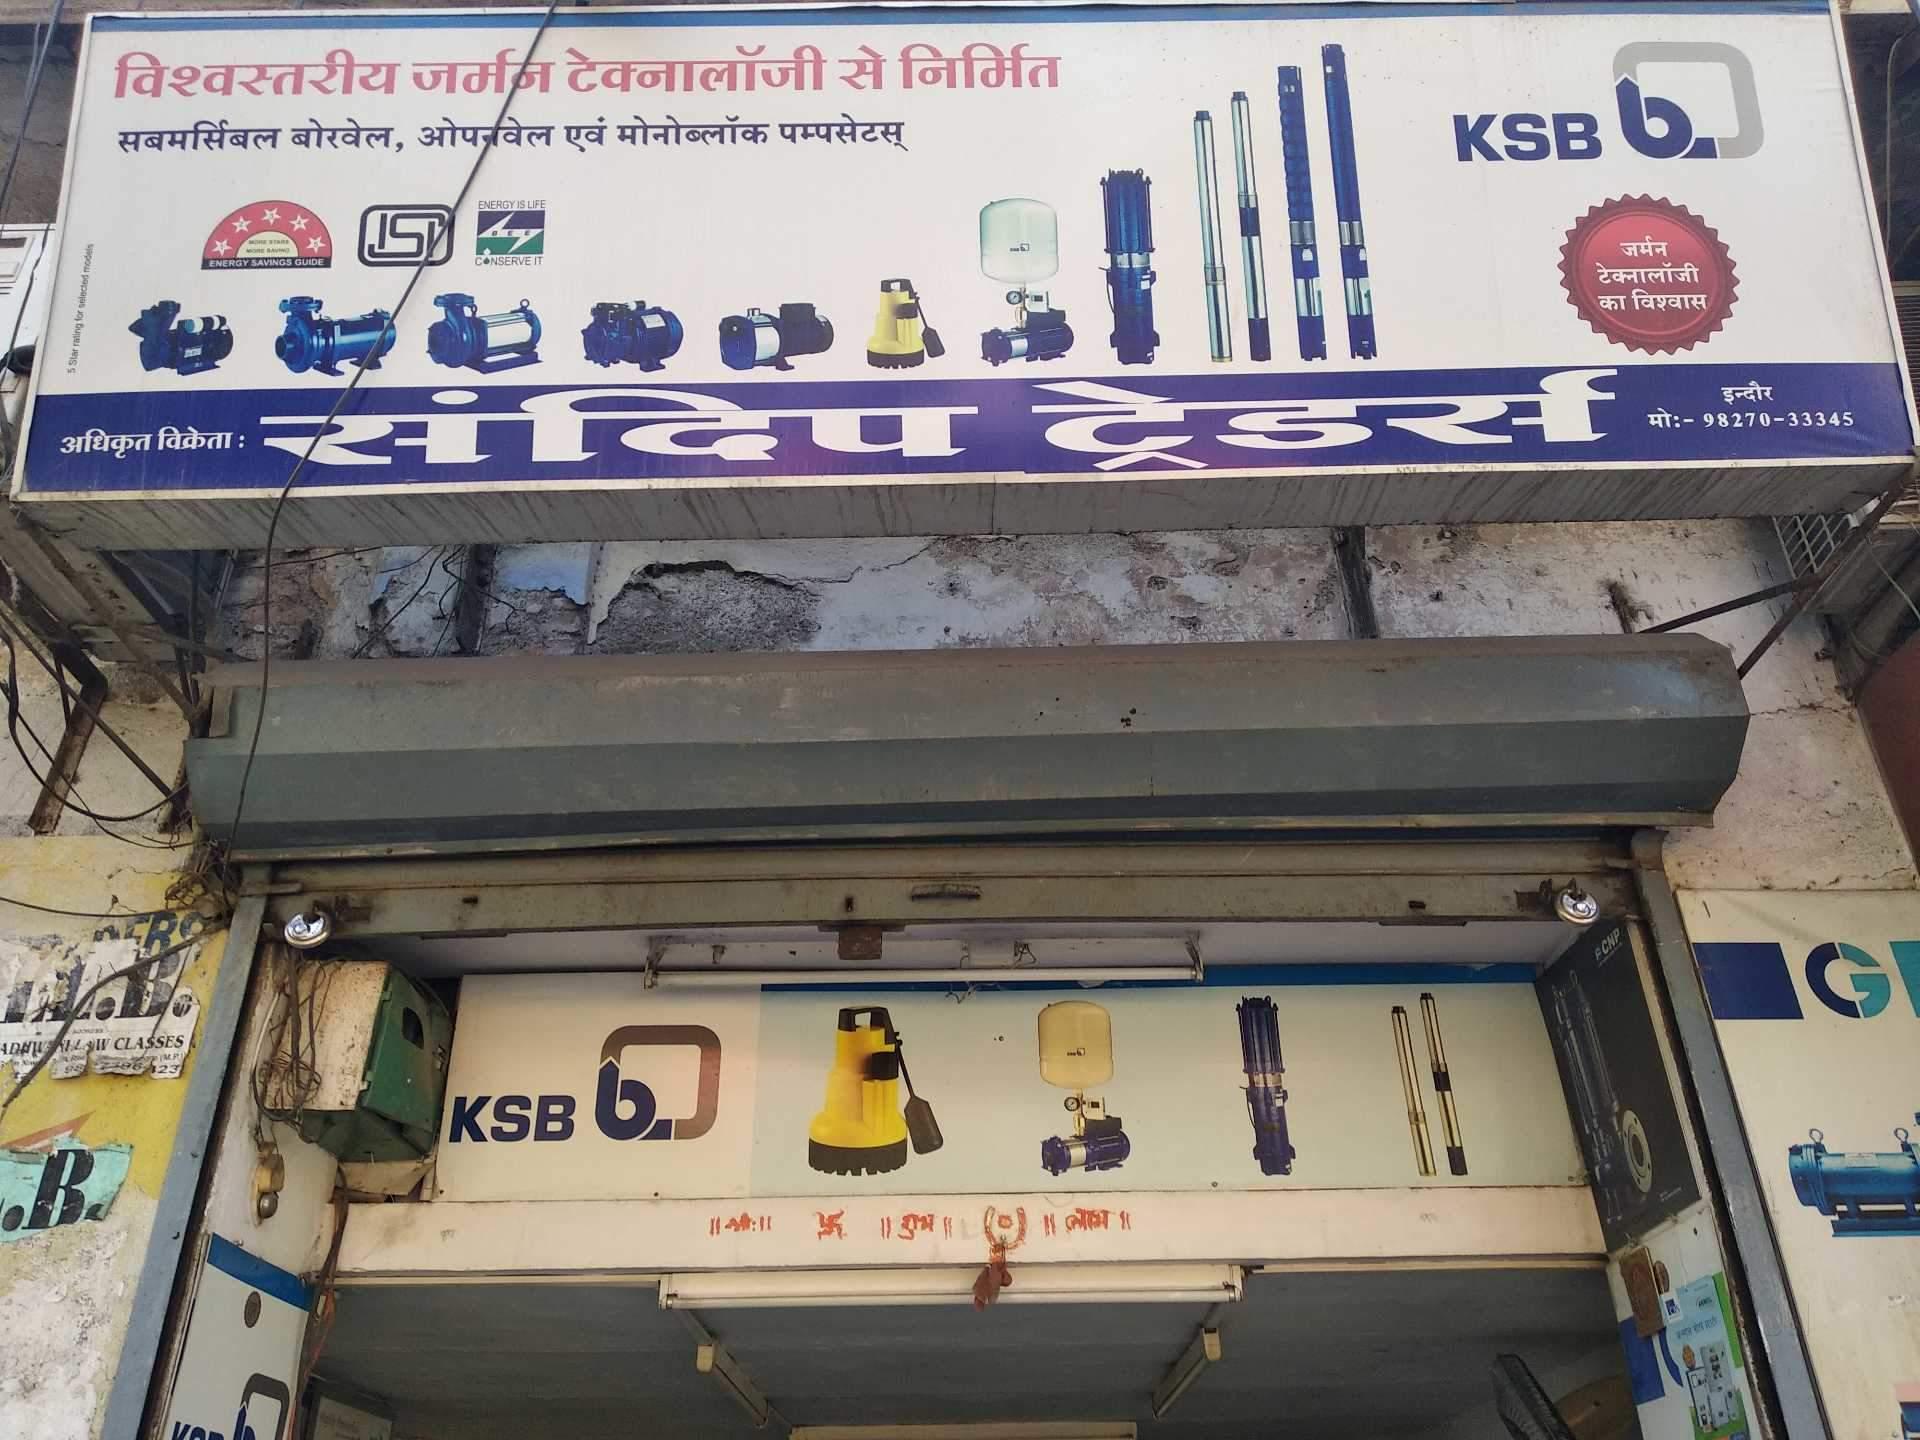 Top 10 Ksb Submersible Pump Dealers in Indore - Best Ksb